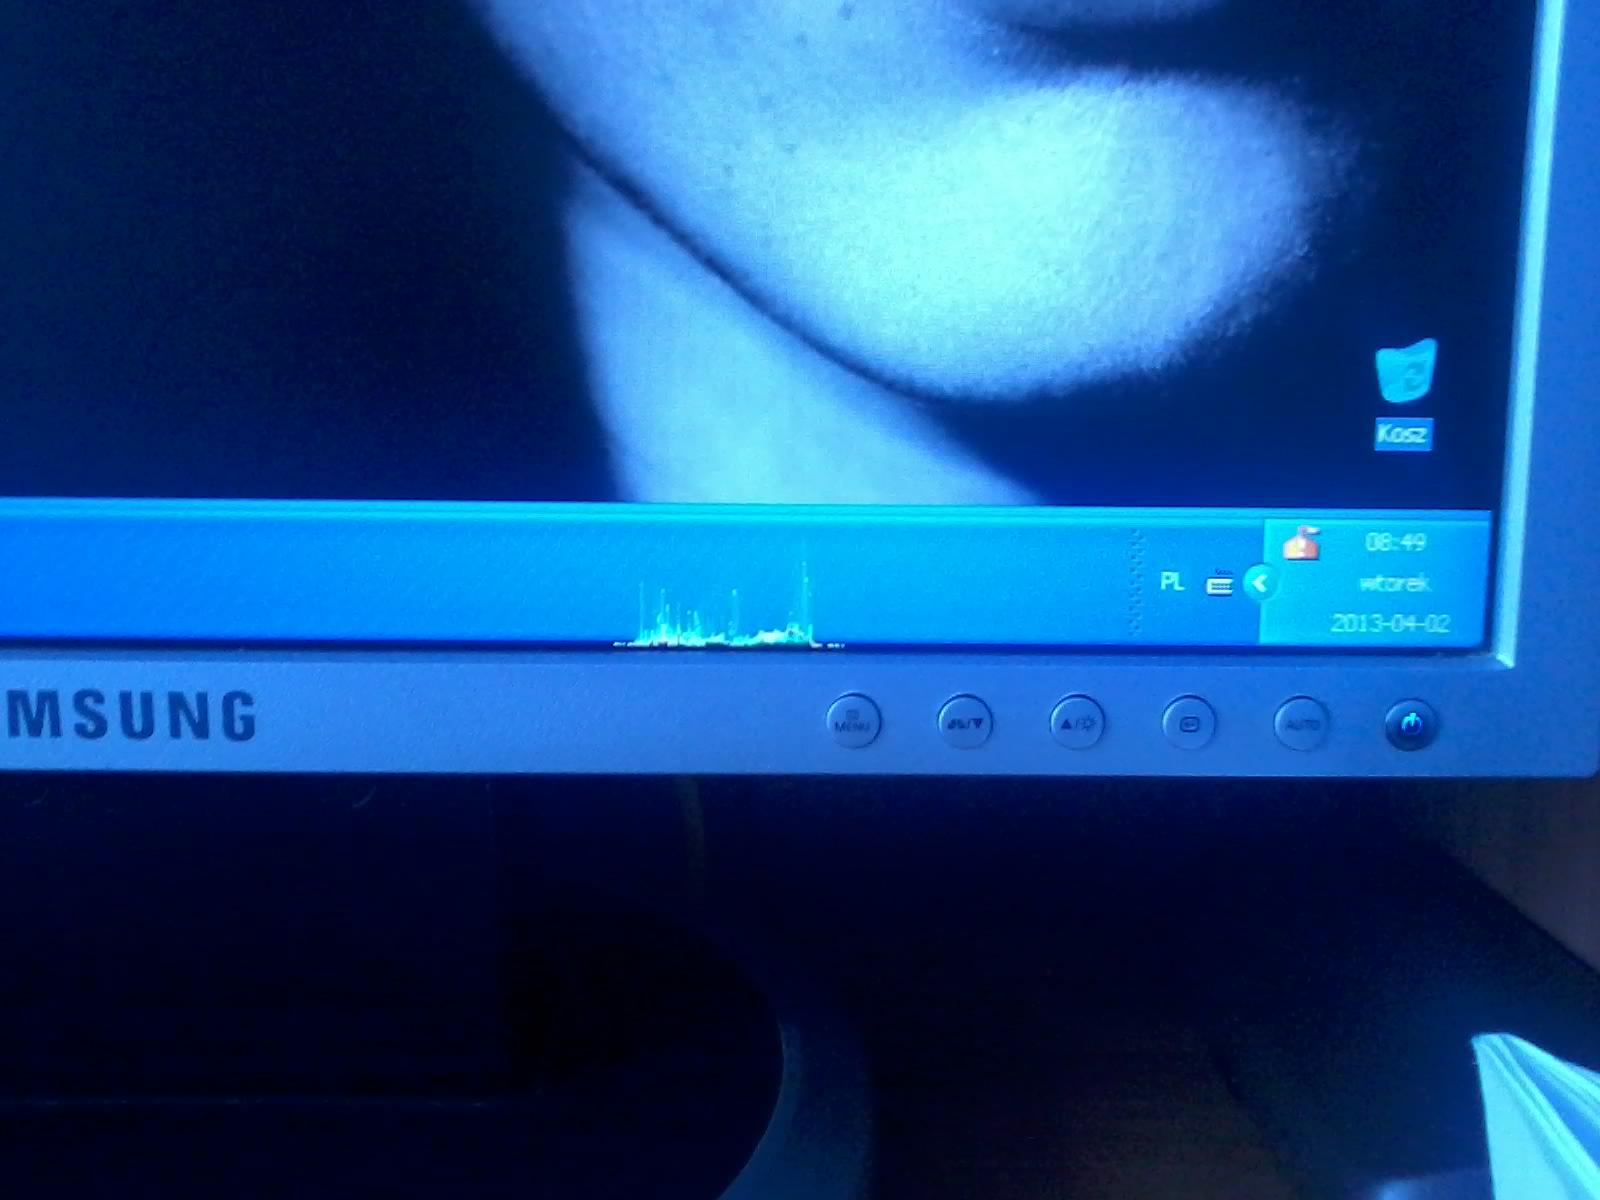 Samsung SyncMaster 940N - Samsung SyncMaster 940N plama